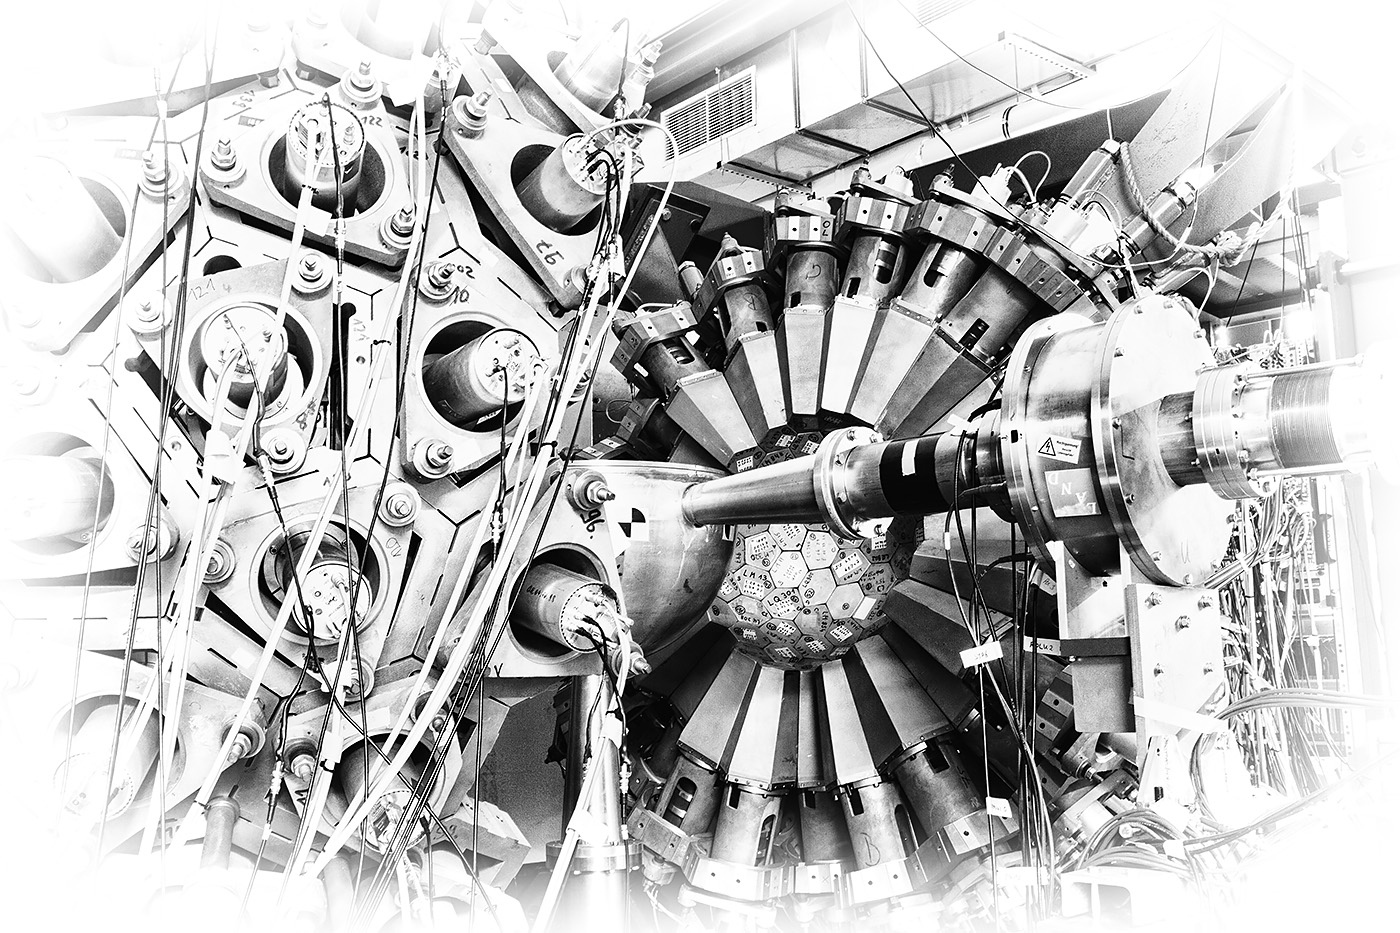 GSI Darmstadt Crystal Ball Detektor